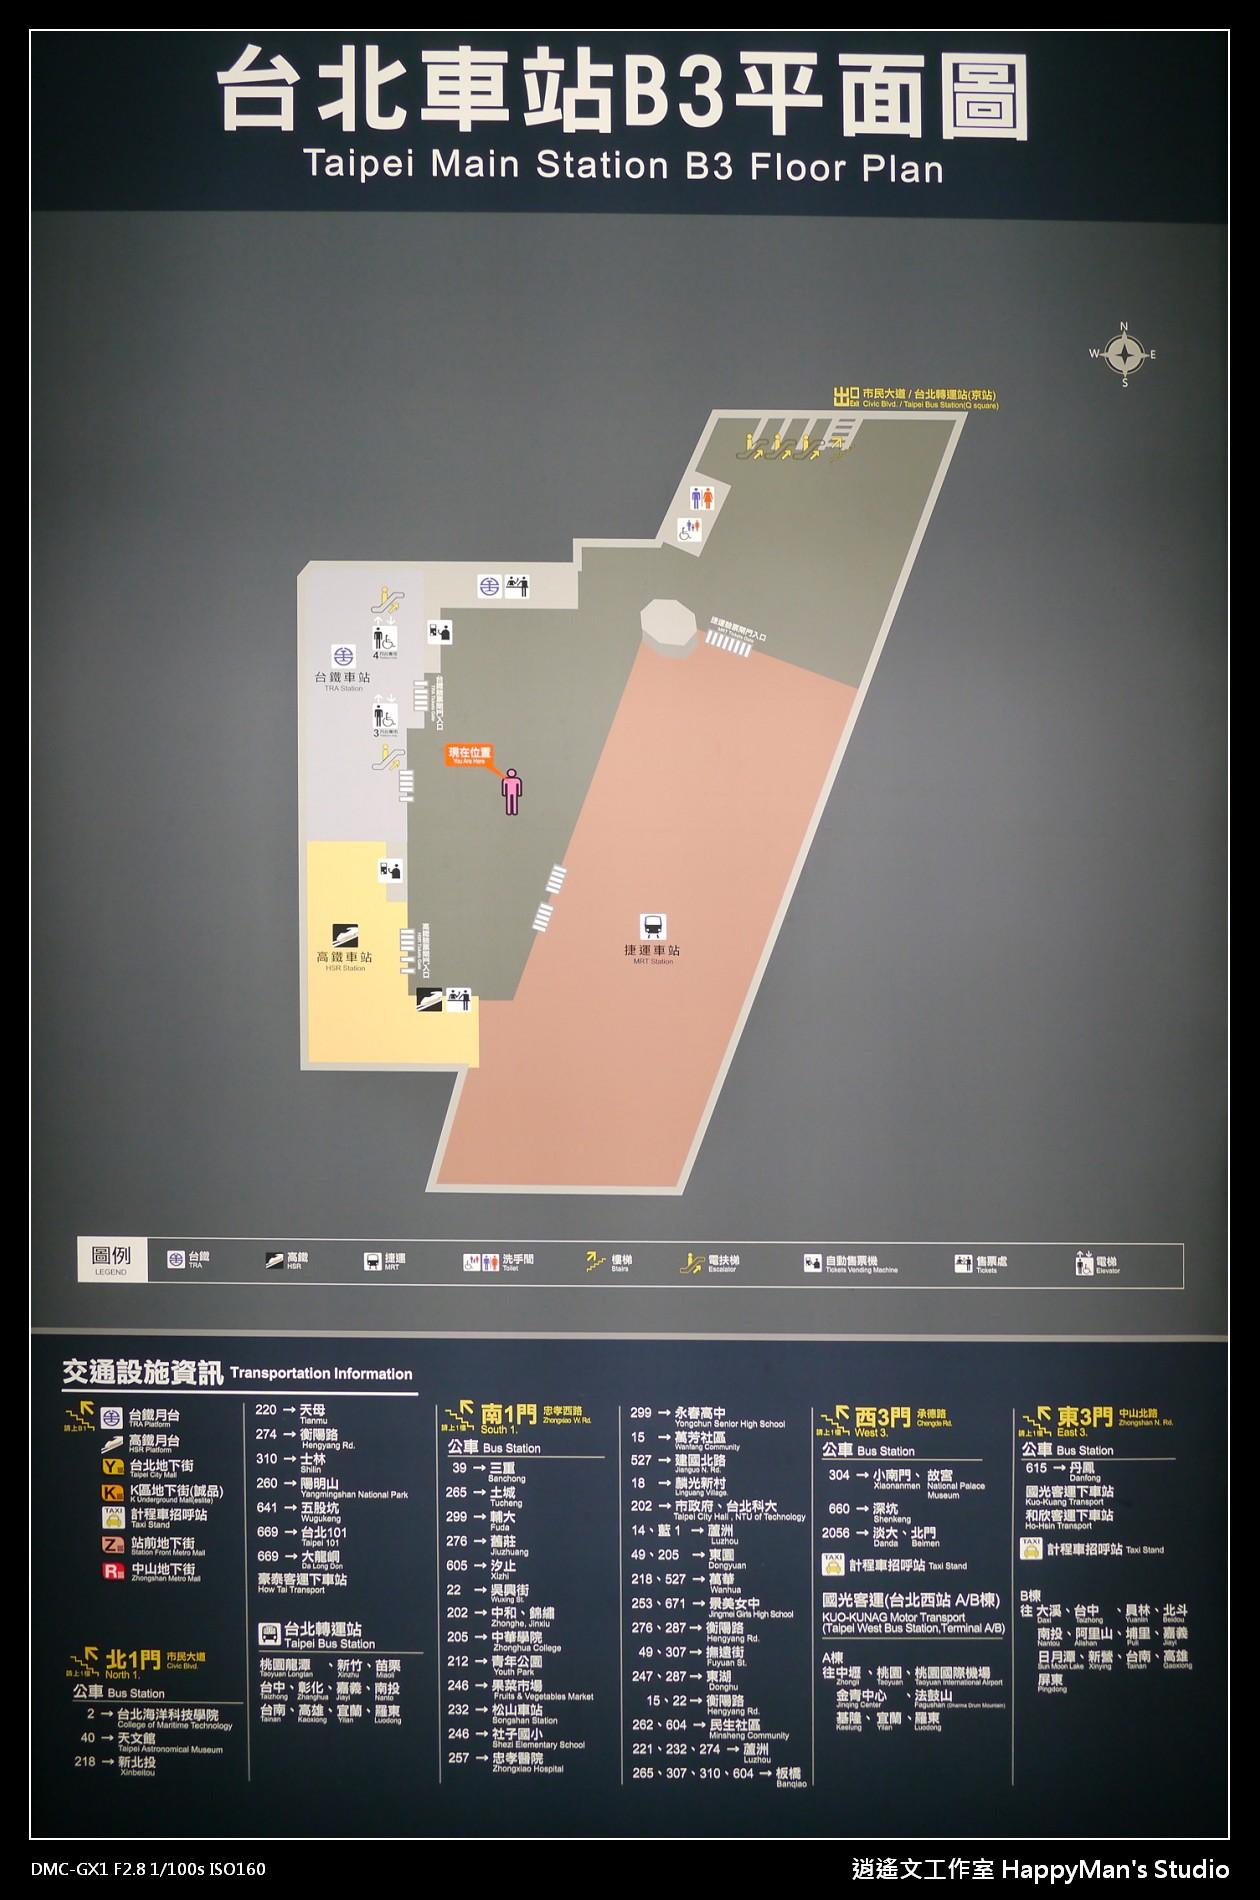 台北車站B3平面圖 (Taipei Main Station B3 Plan)